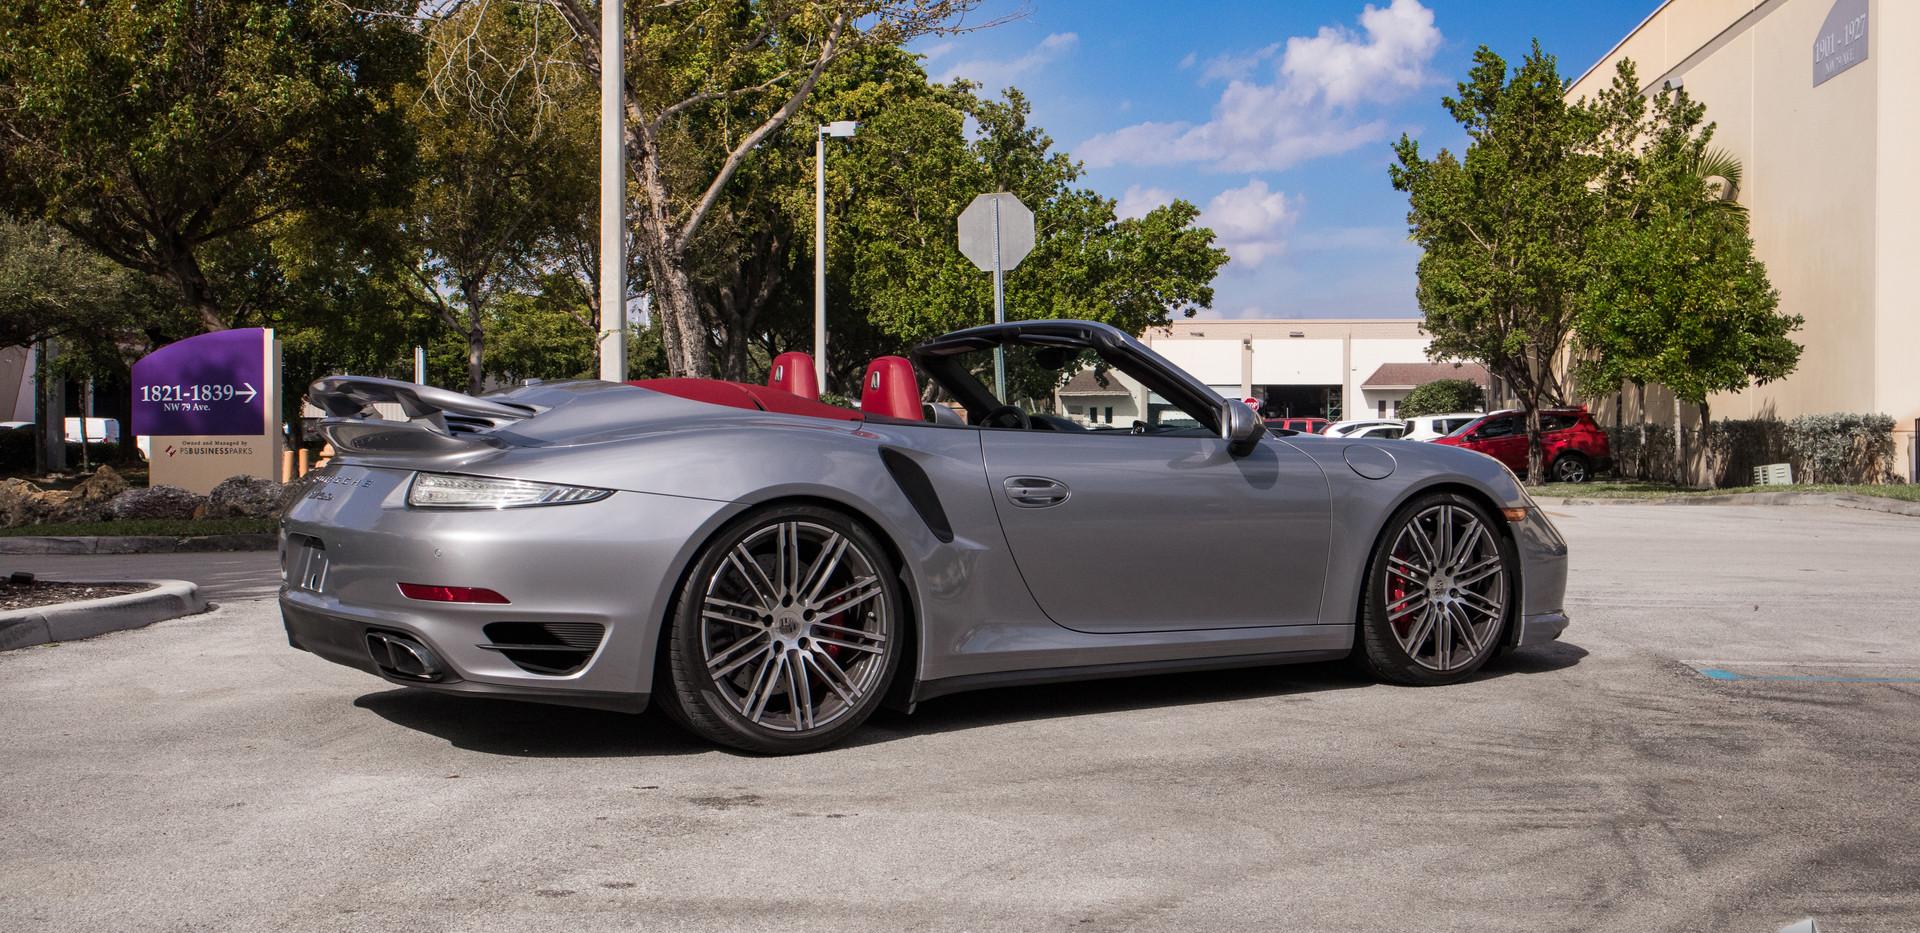 PorscheTurbo Silver00004.jpg